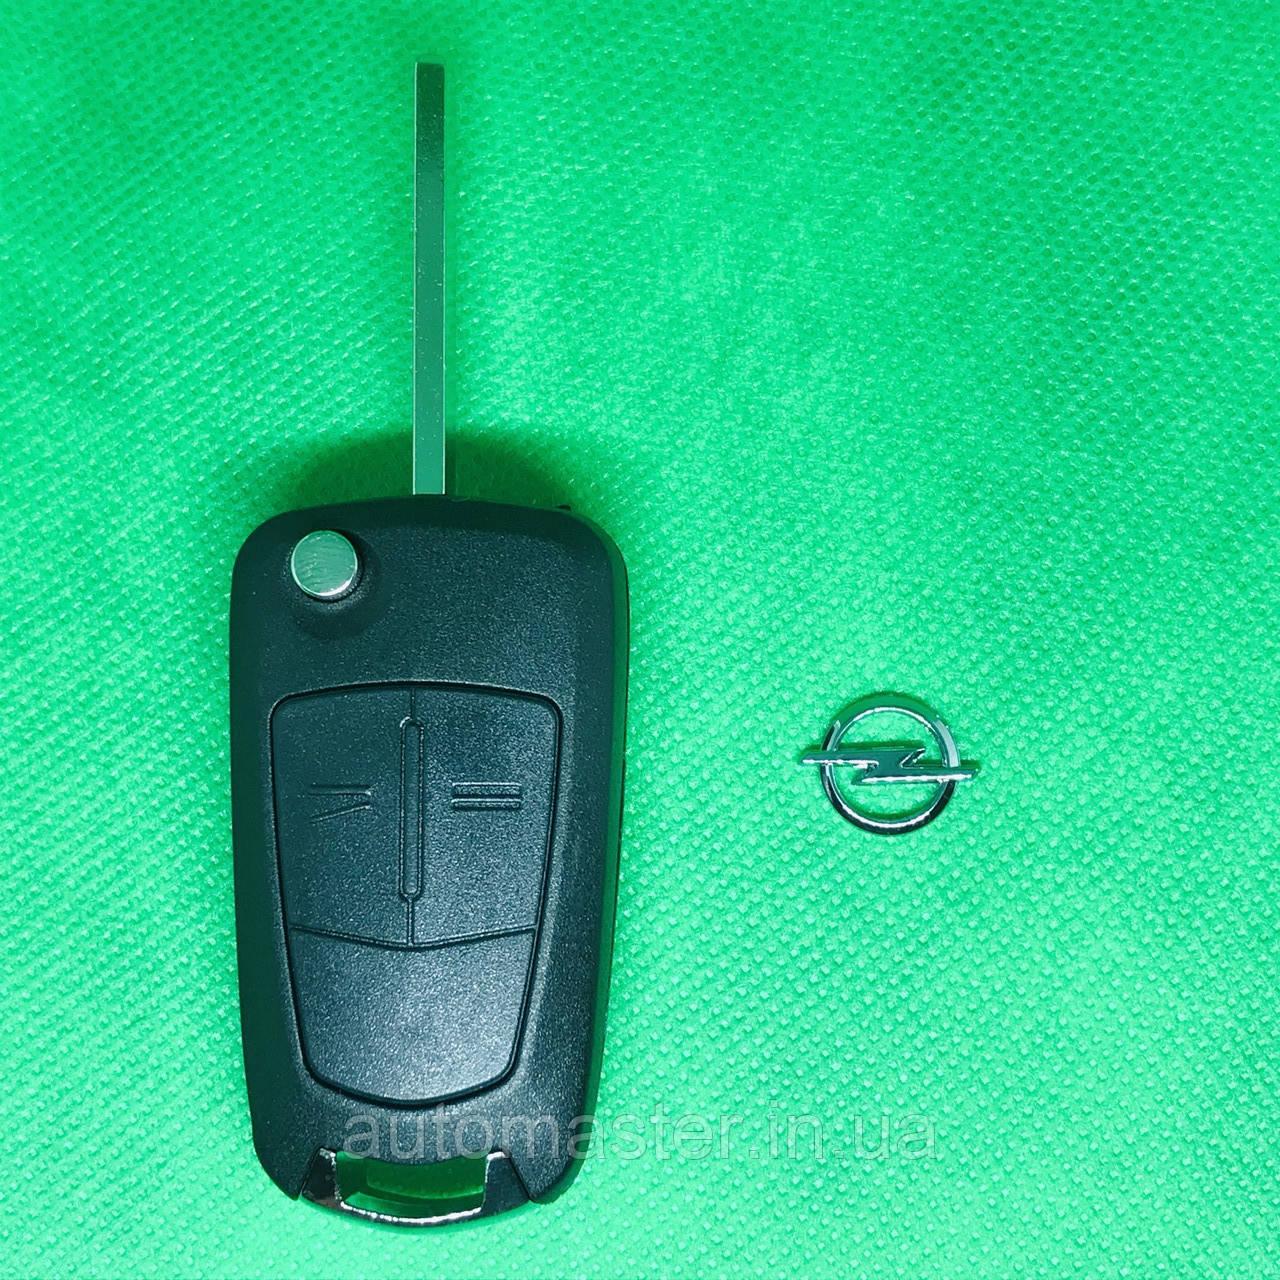 Корпус выкидного  авто ключа OPEL Astra Н, Zafira, Vectra (Опель Астра Н, Зафира, Вектра) 2кнопки,лезвие HU100